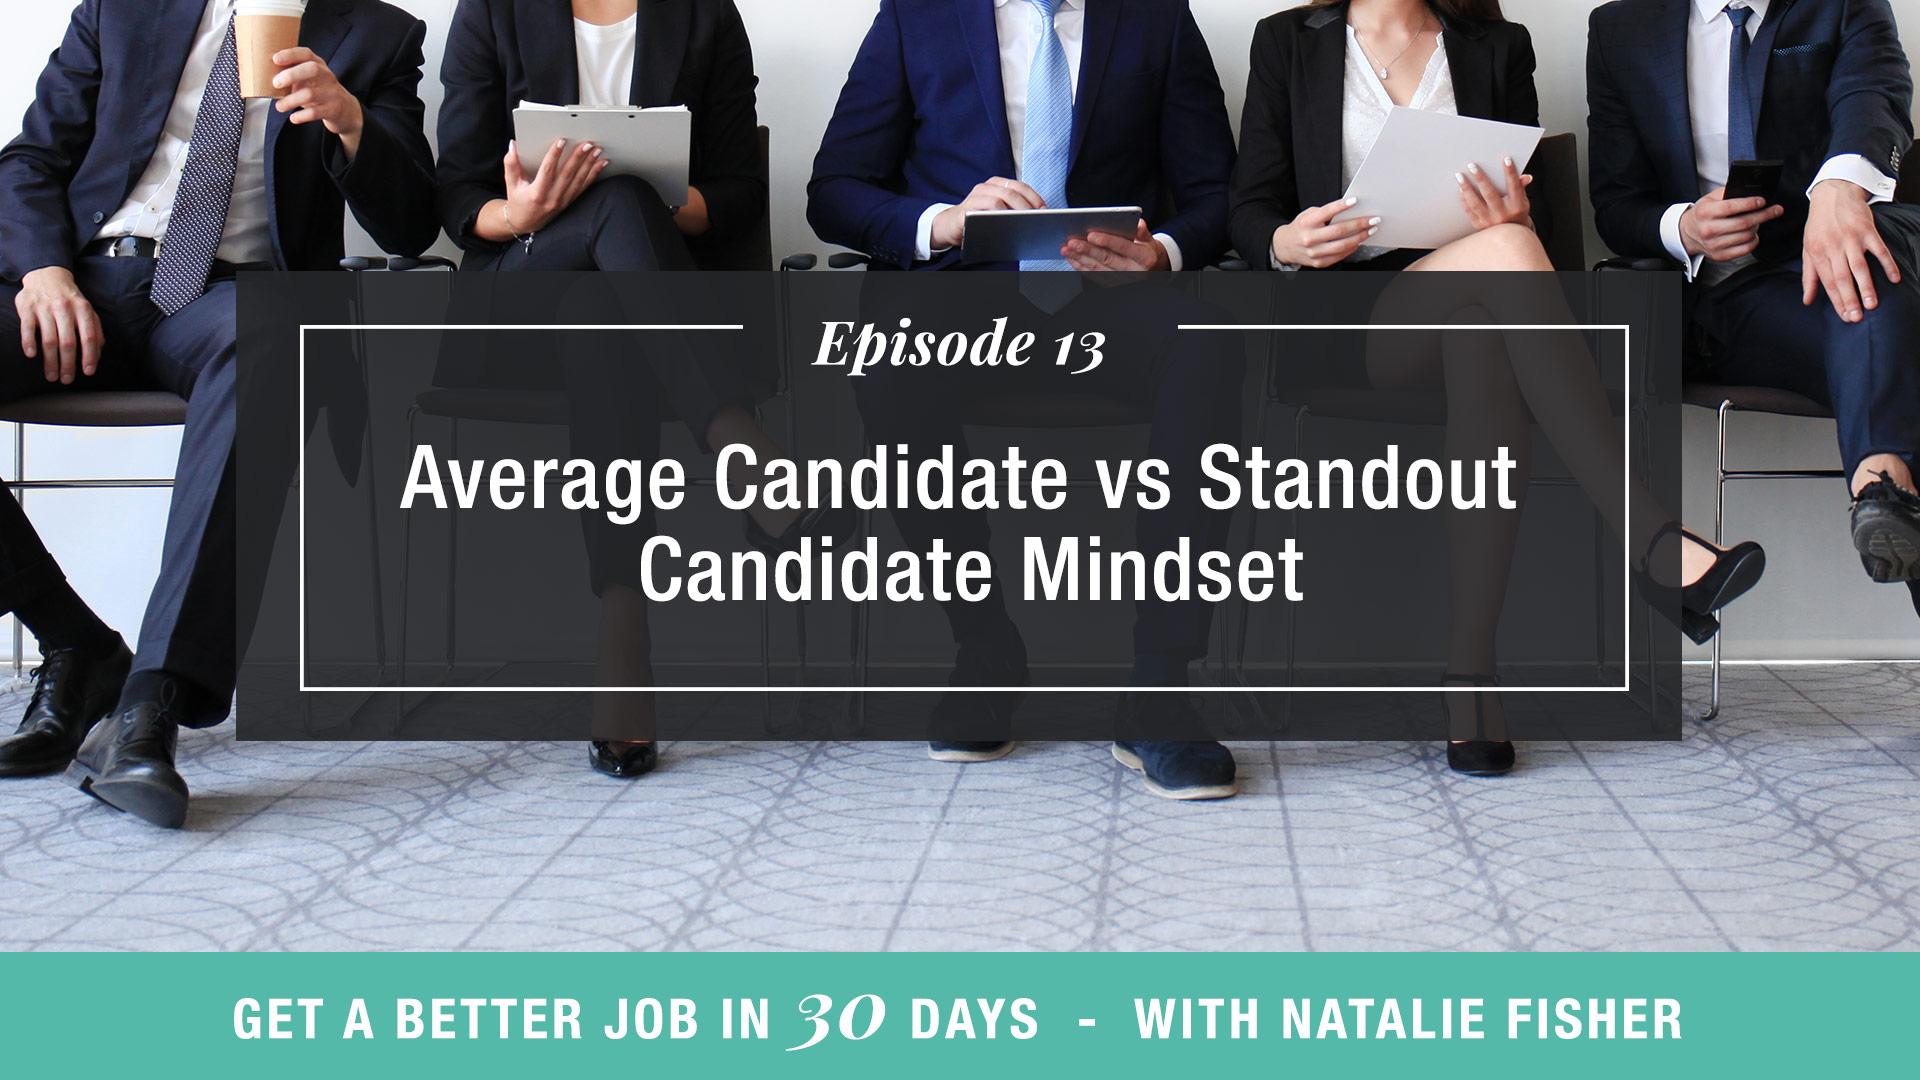 Average Candidate vs Standout Candidate Mindset